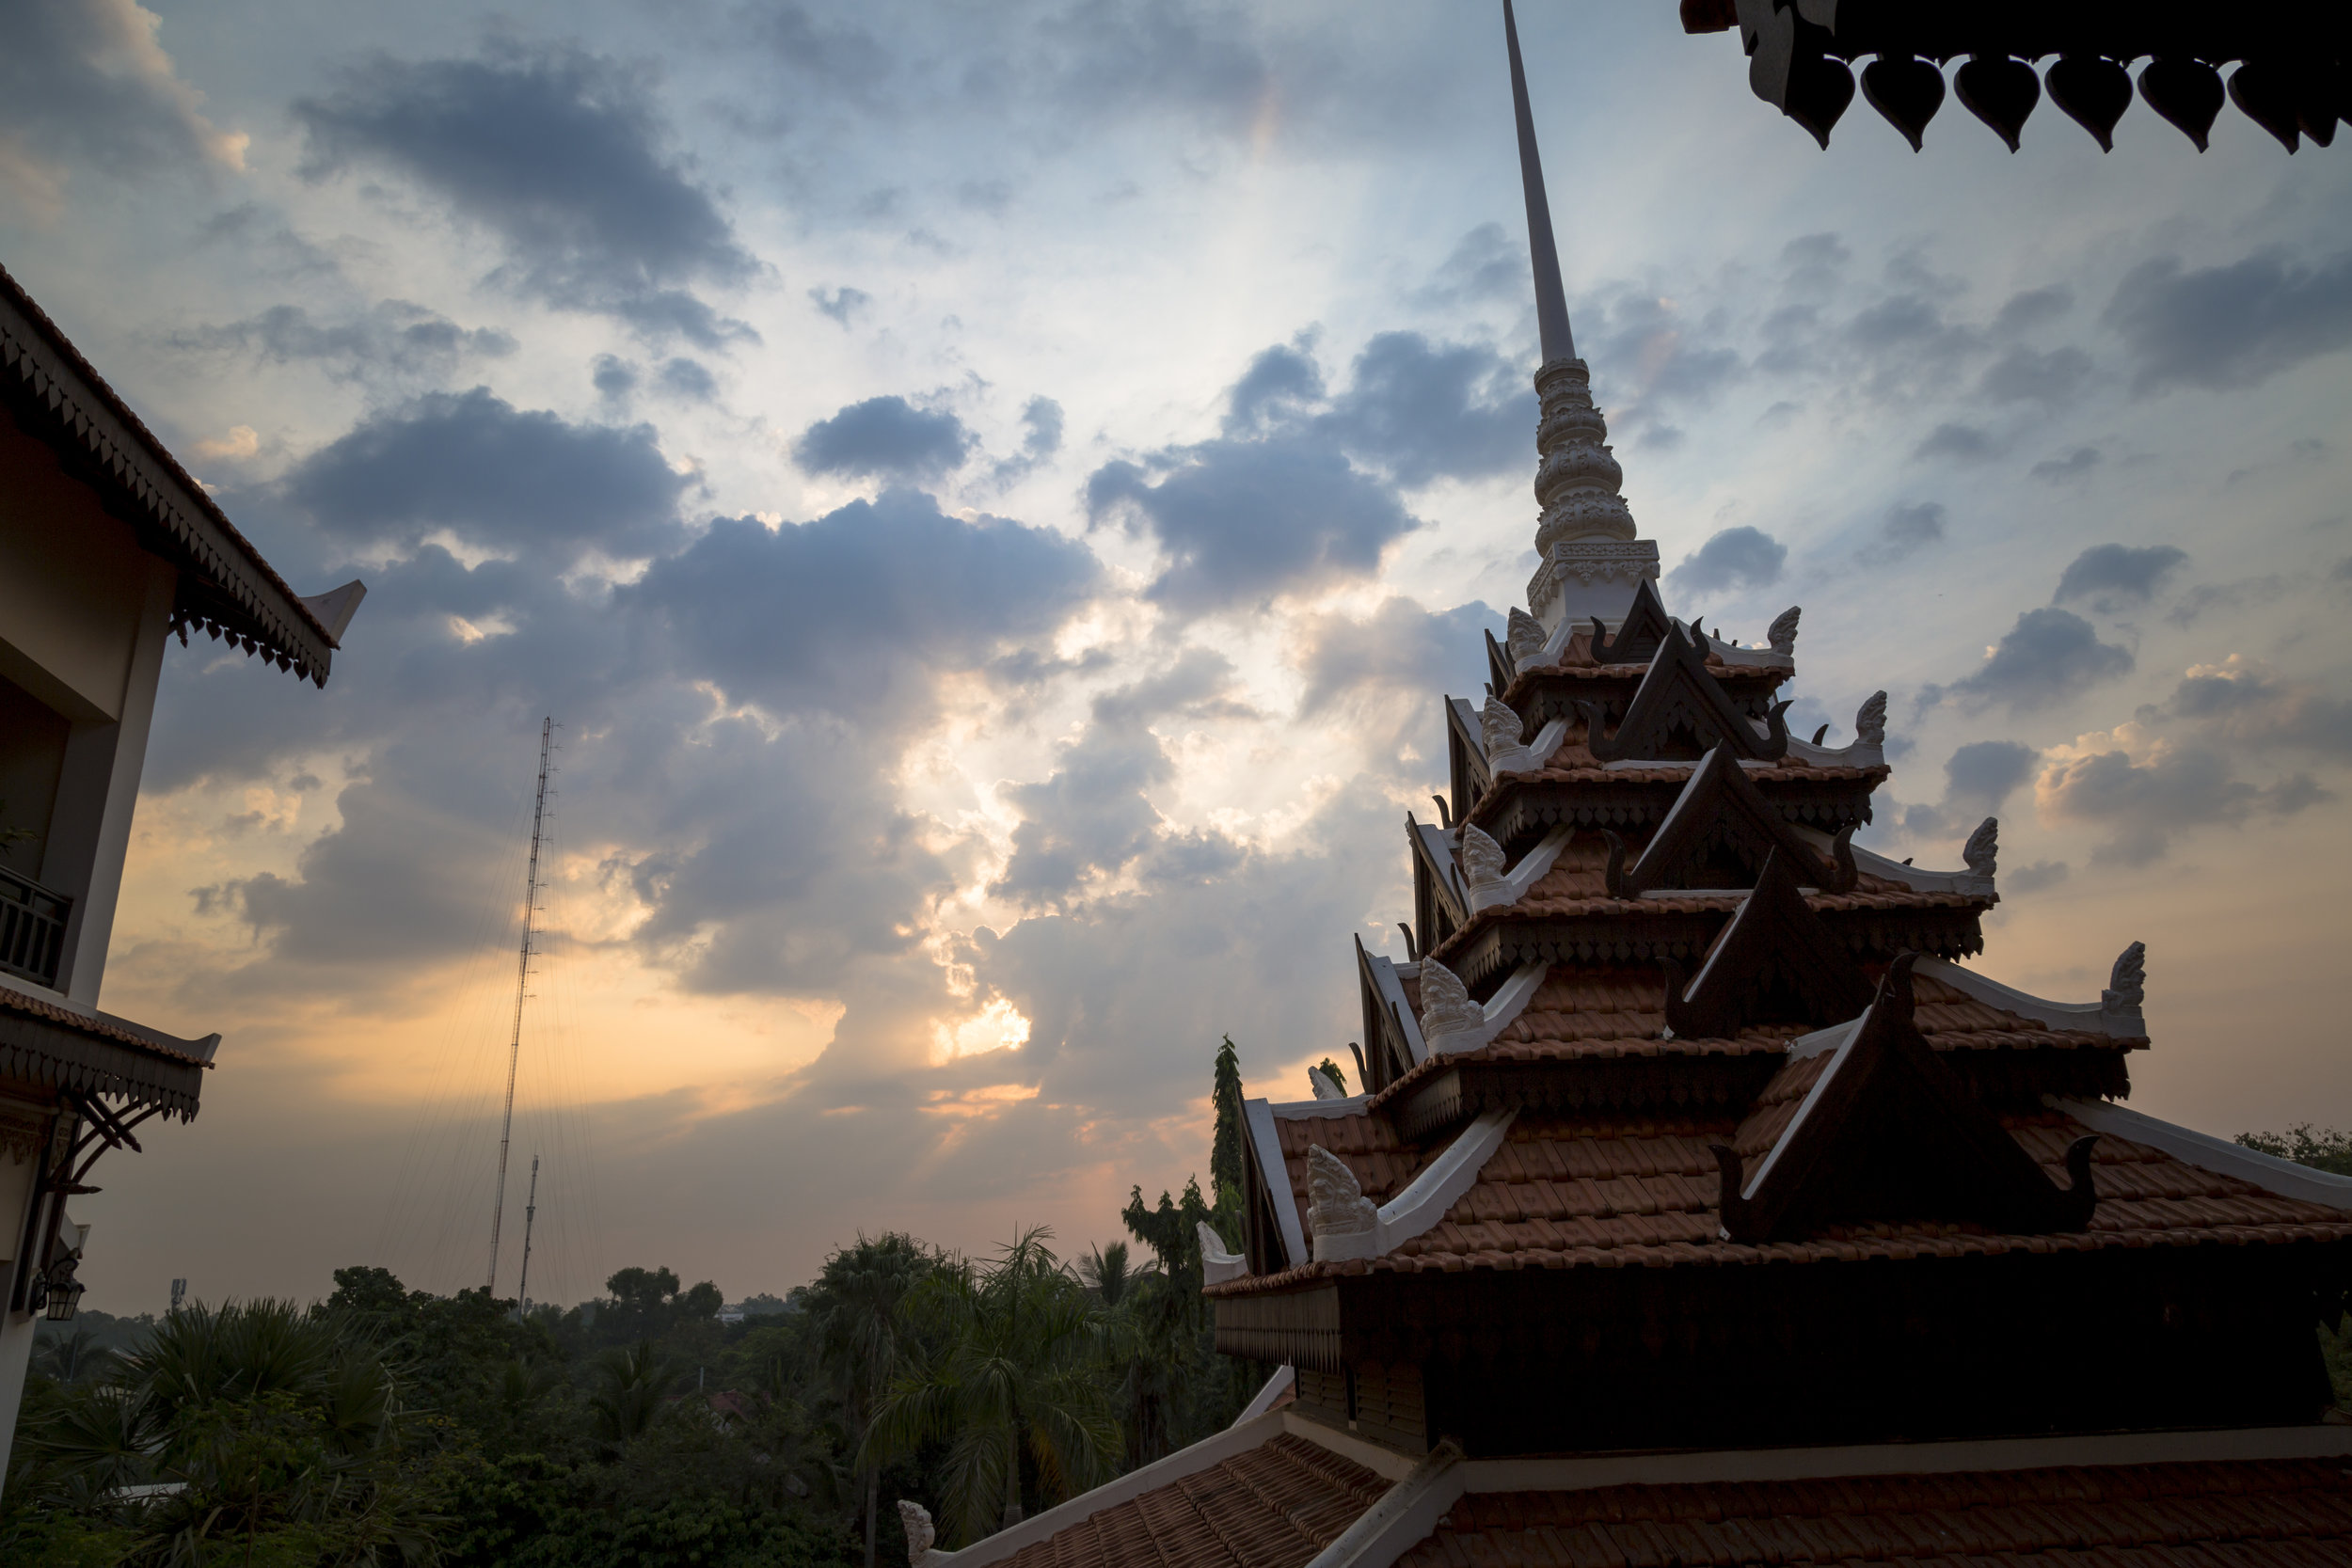 Saem Siemreap Hotel - Siem Reap, Cambodia